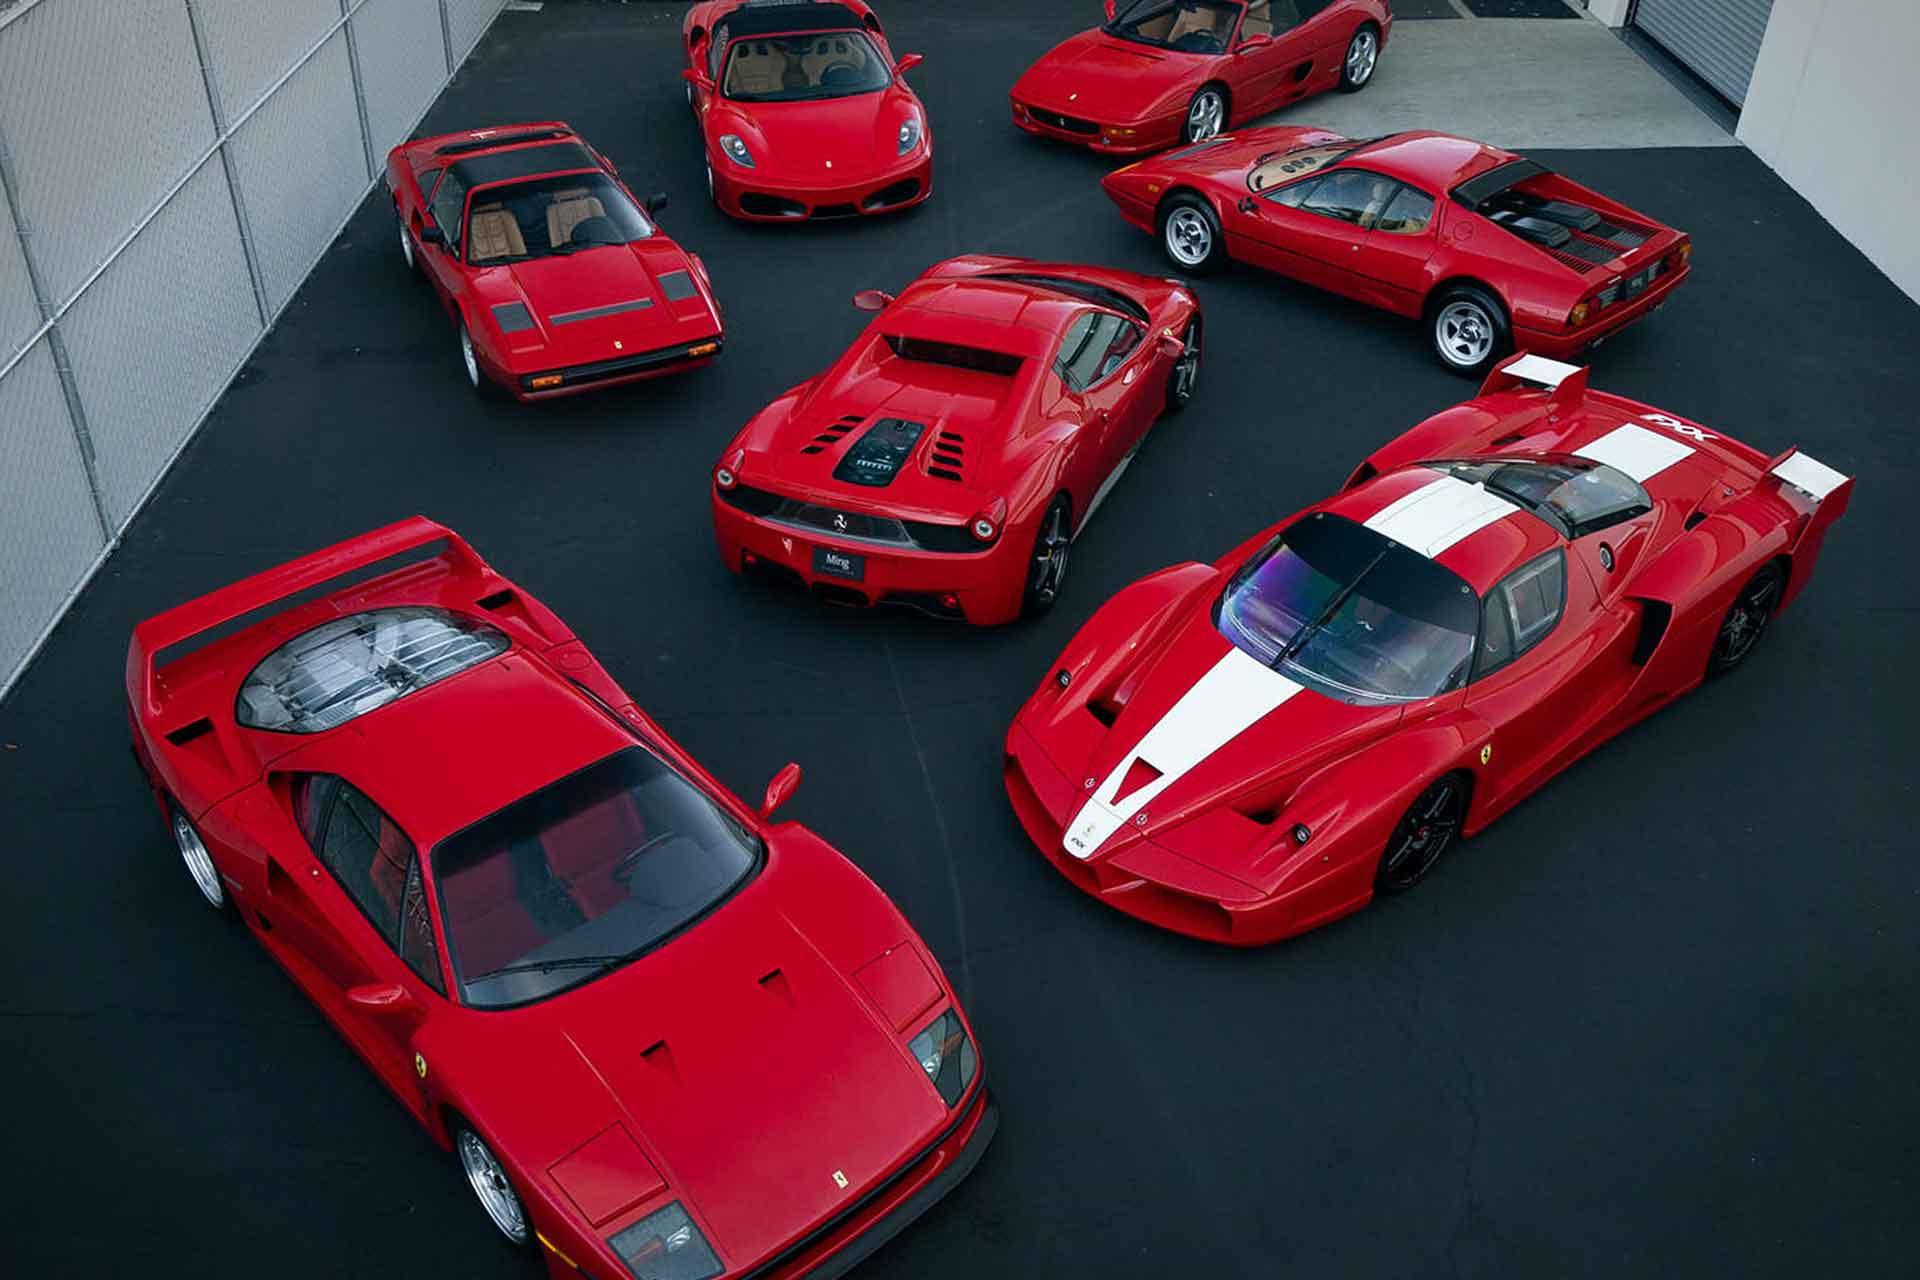 Ming Ferrari Collection